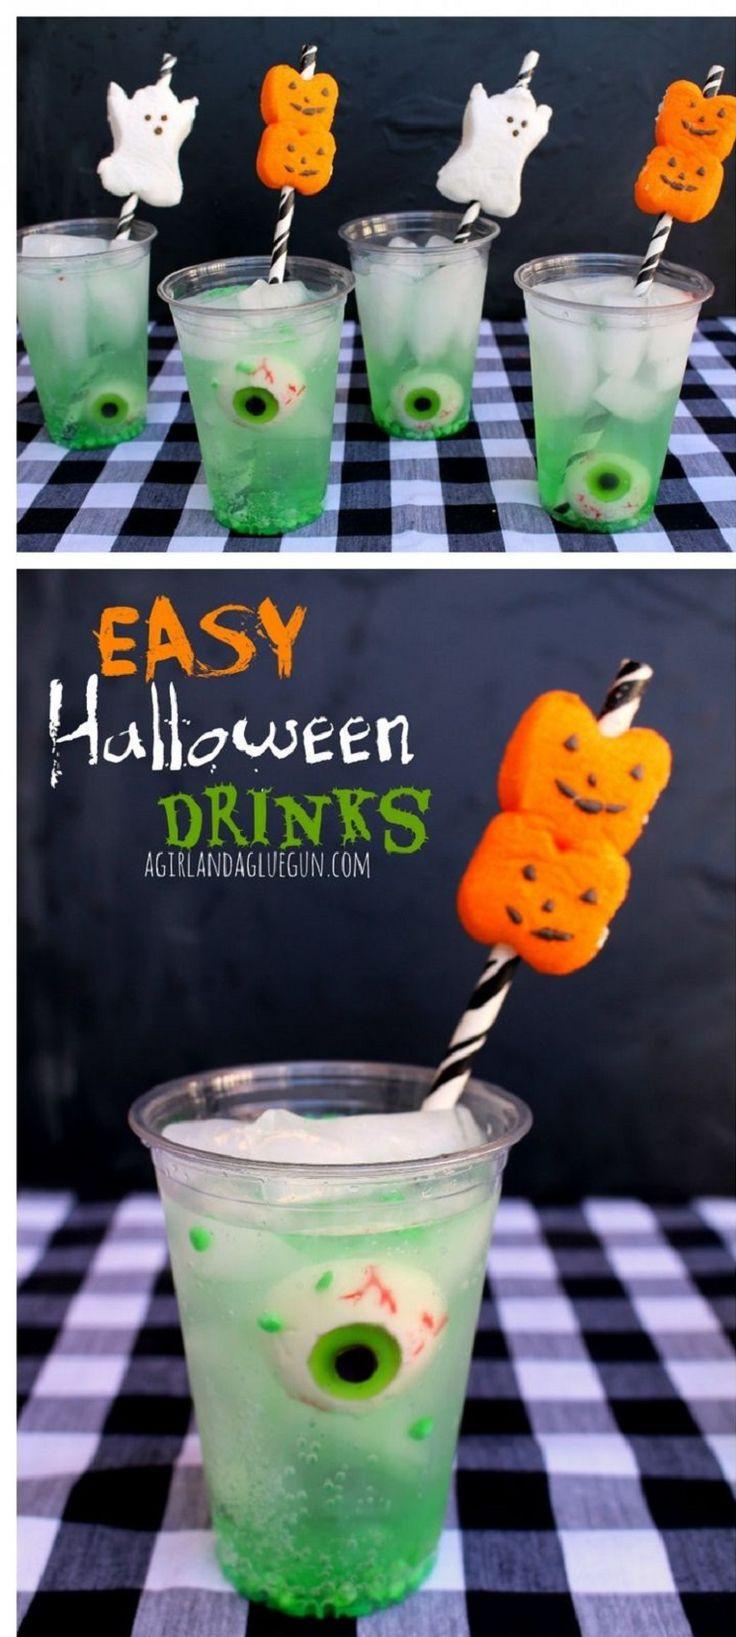 Easy Halloween Alcoholic Drinks  17 Best ideas about Adult Halloween Drinks on Pinterest